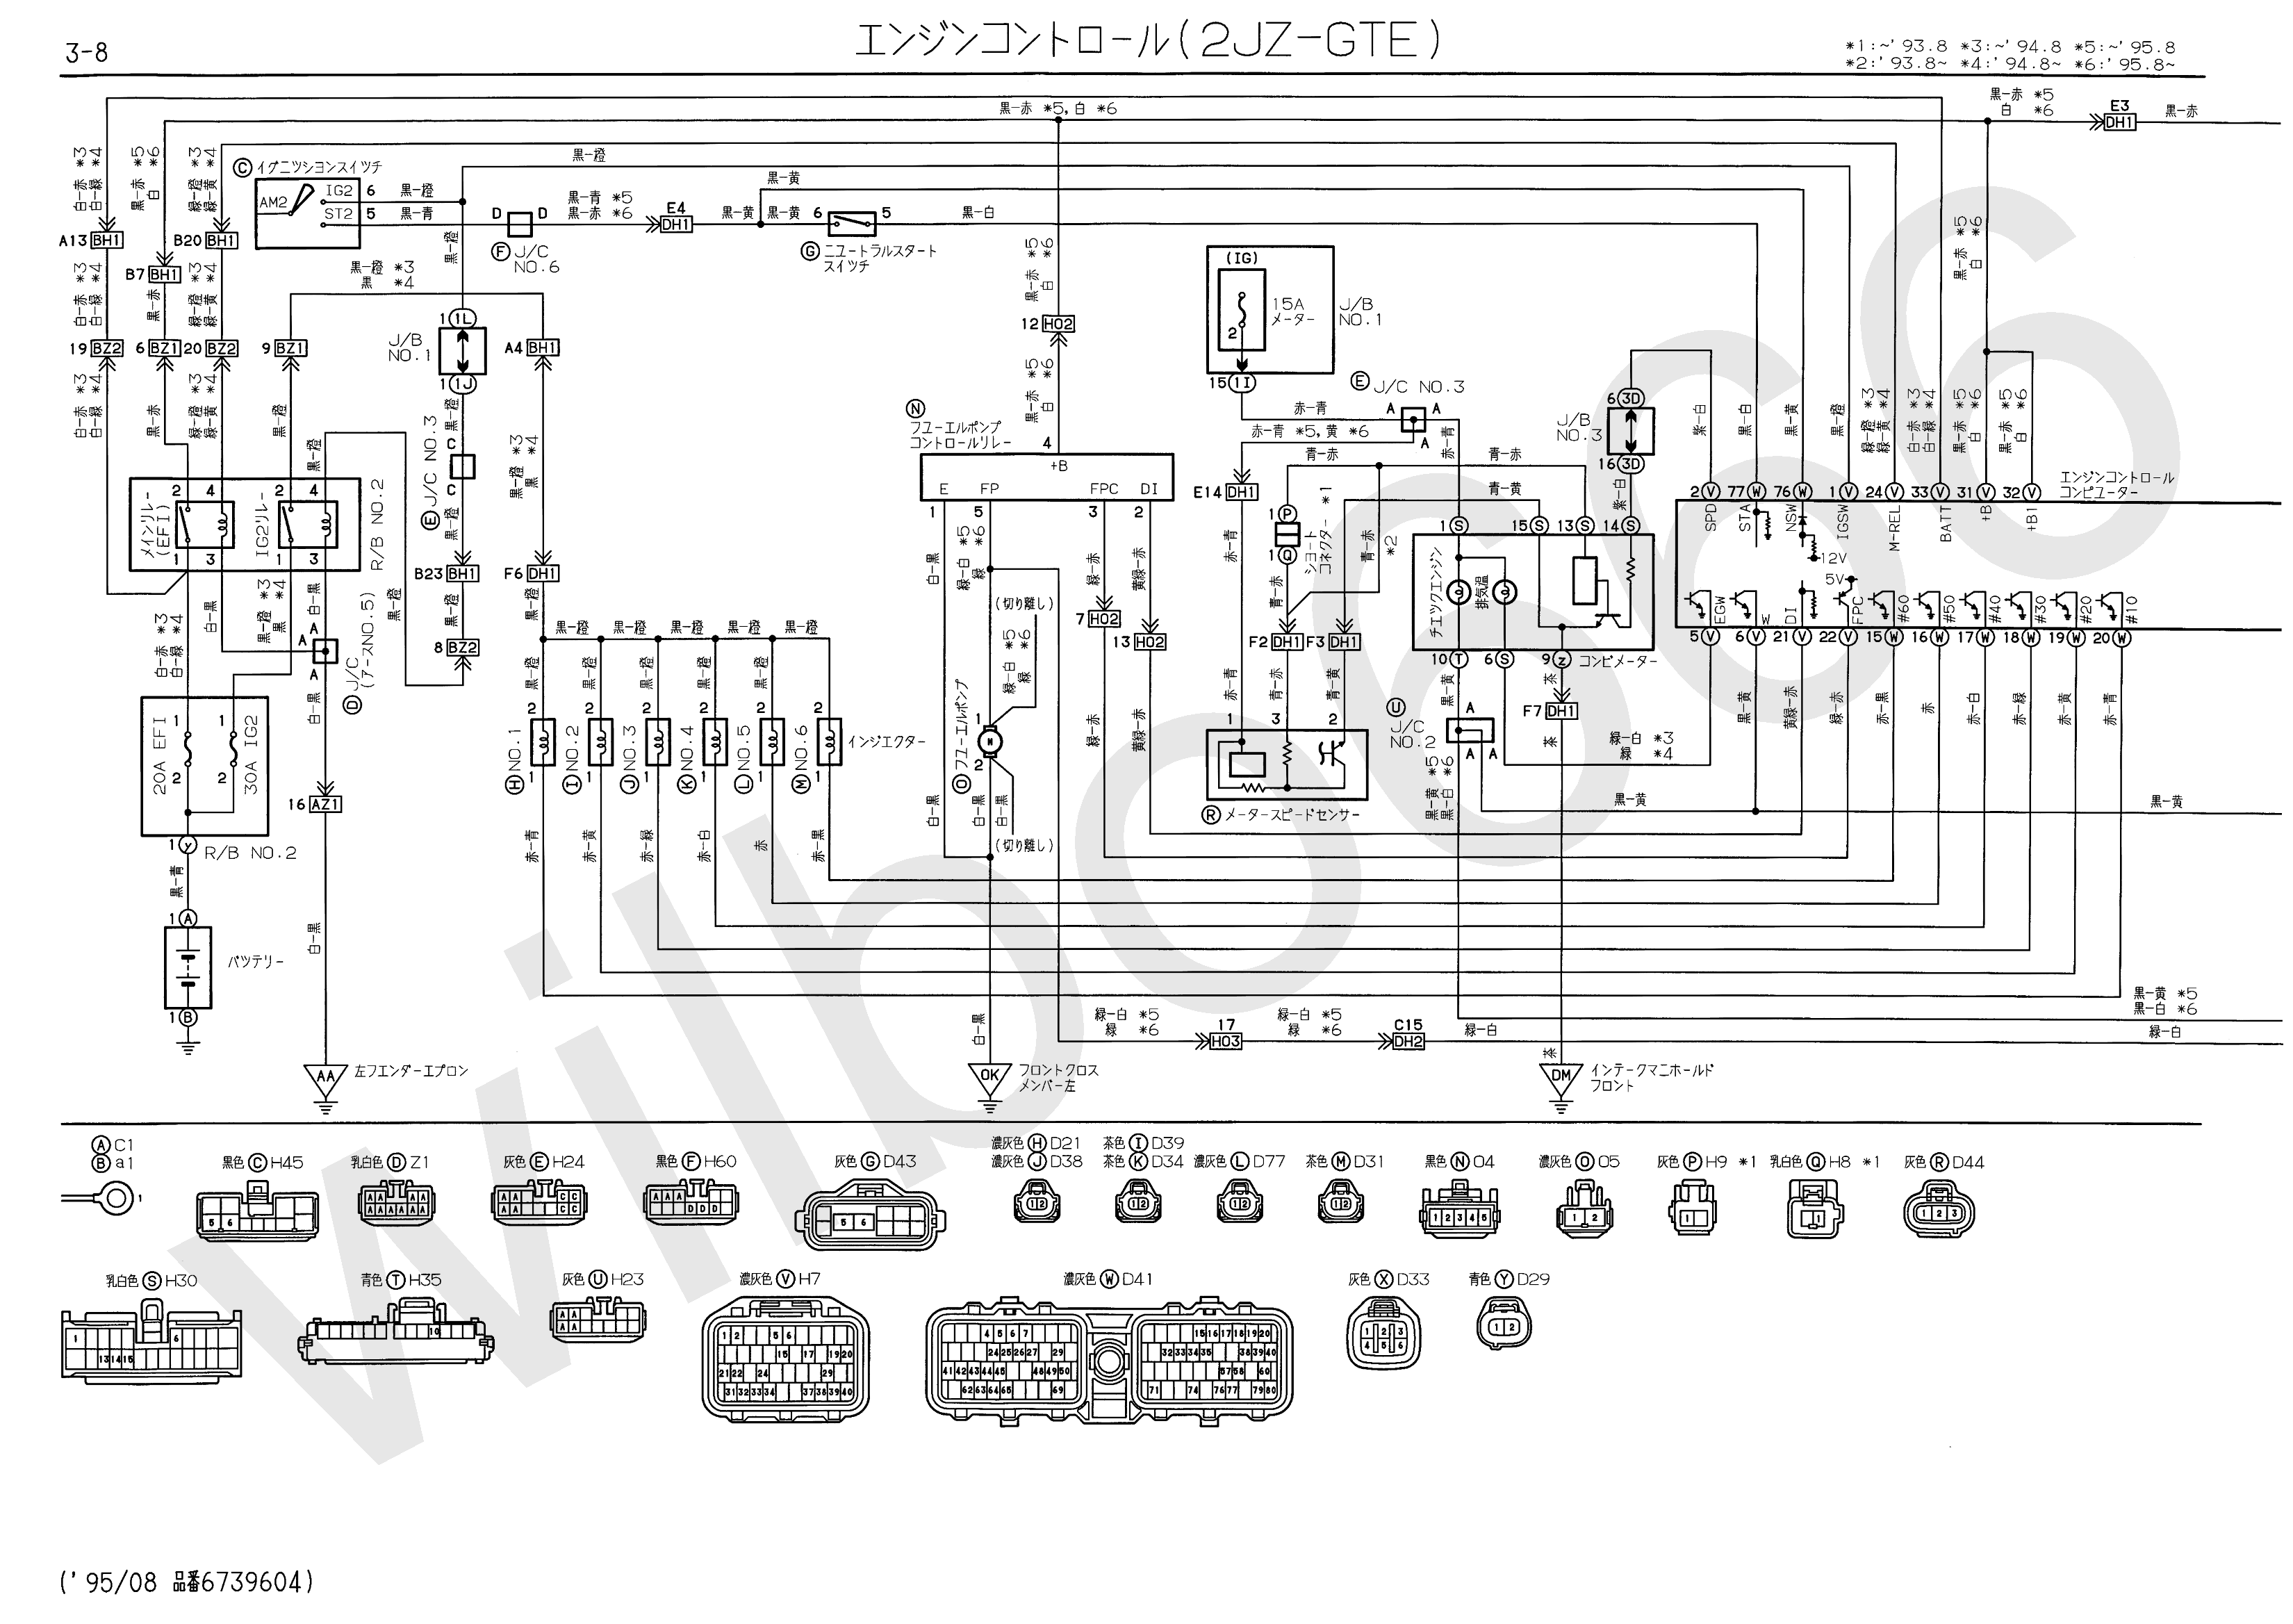 Groovy 240Z Wiring Harness Basic Electronics Wiring Diagram Wiring Cloud Filiciilluminateatxorg